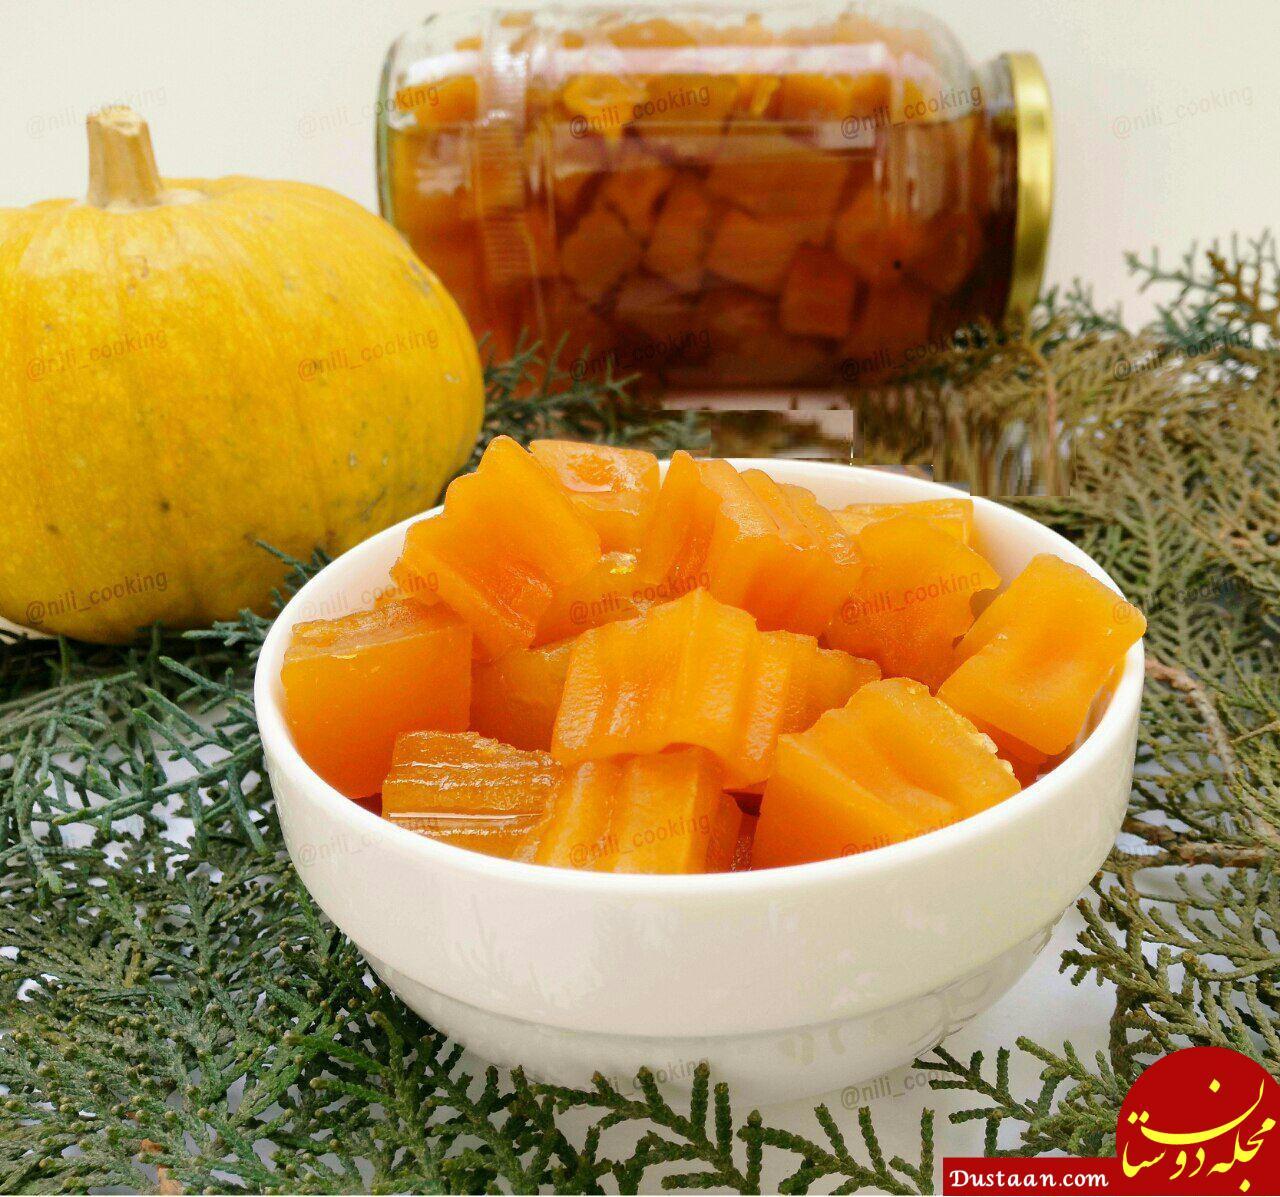 www.dustaan.com طرز تهیه مربای «کدو حلوایی» در خانه به سبکی خوشمزه